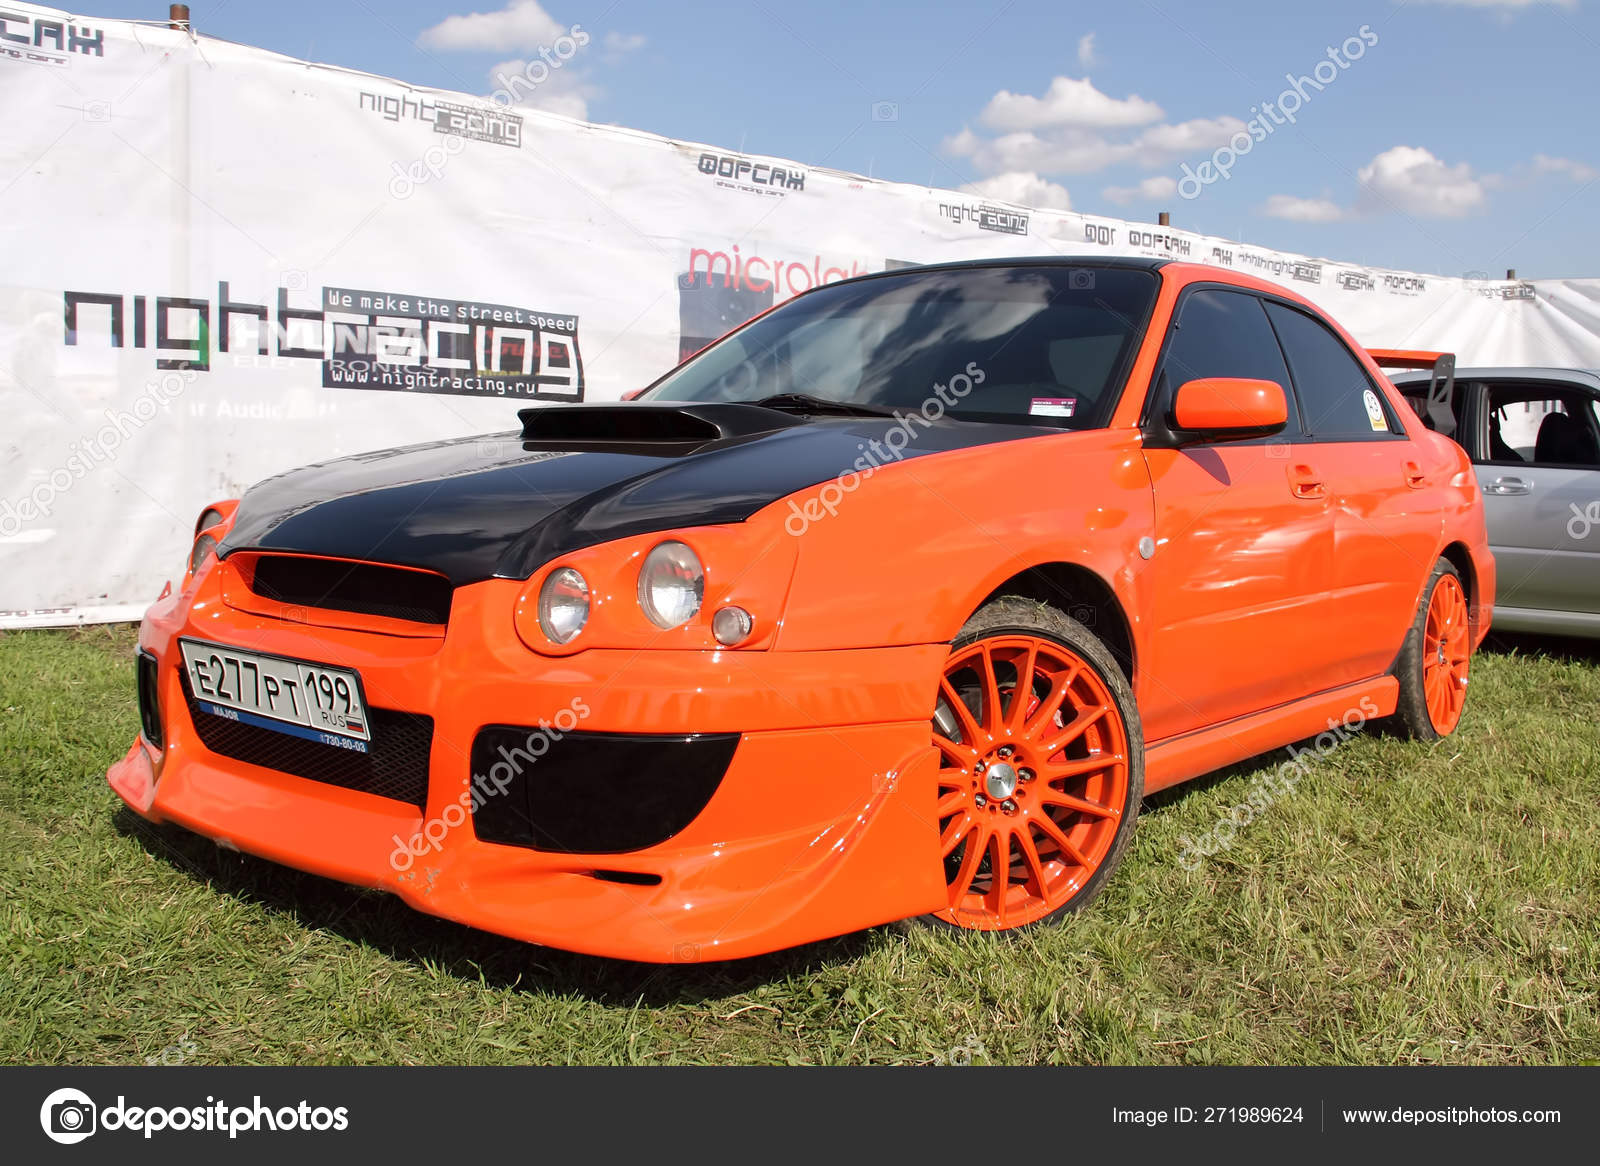 Moscow, Russia - May 25, 2019: A bright orange Subaru WRX